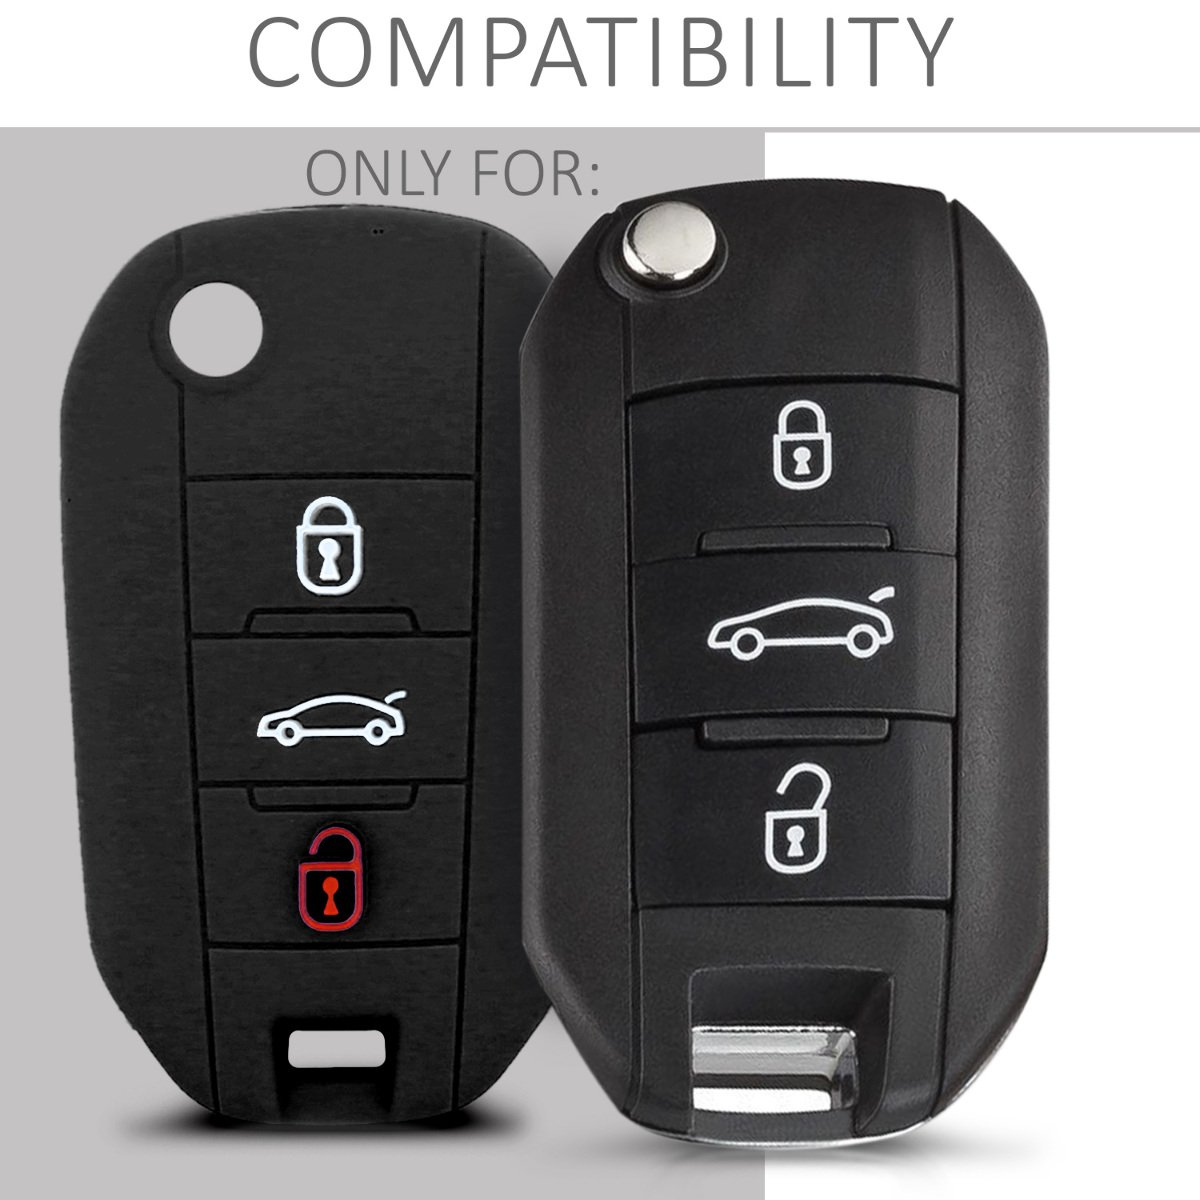 kwmobile Funda de Silicona para Llave Plegable de 3 Botones para Coche Peugeot Citroen: Amazon.es: Electrónica